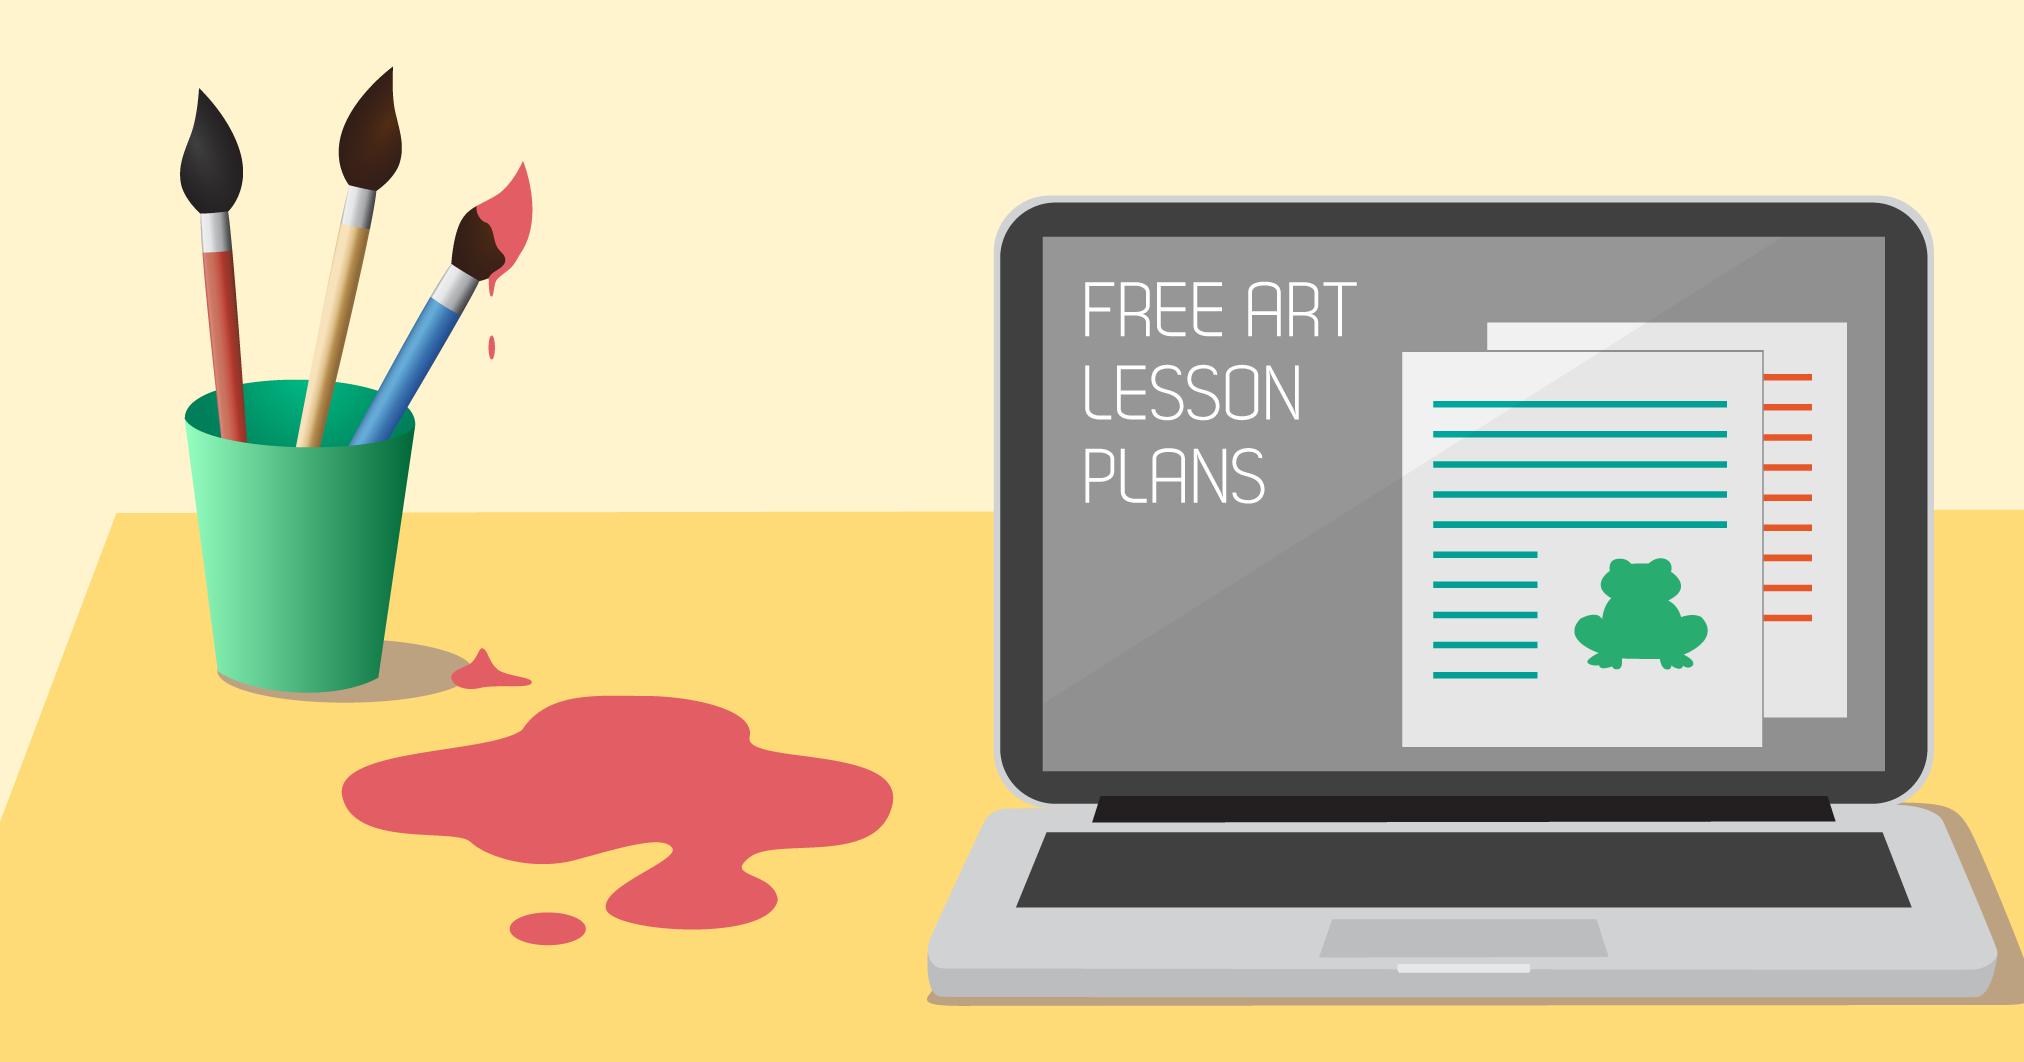 View Larger Image - Lesson Plan, Transparent background PNG HD thumbnail